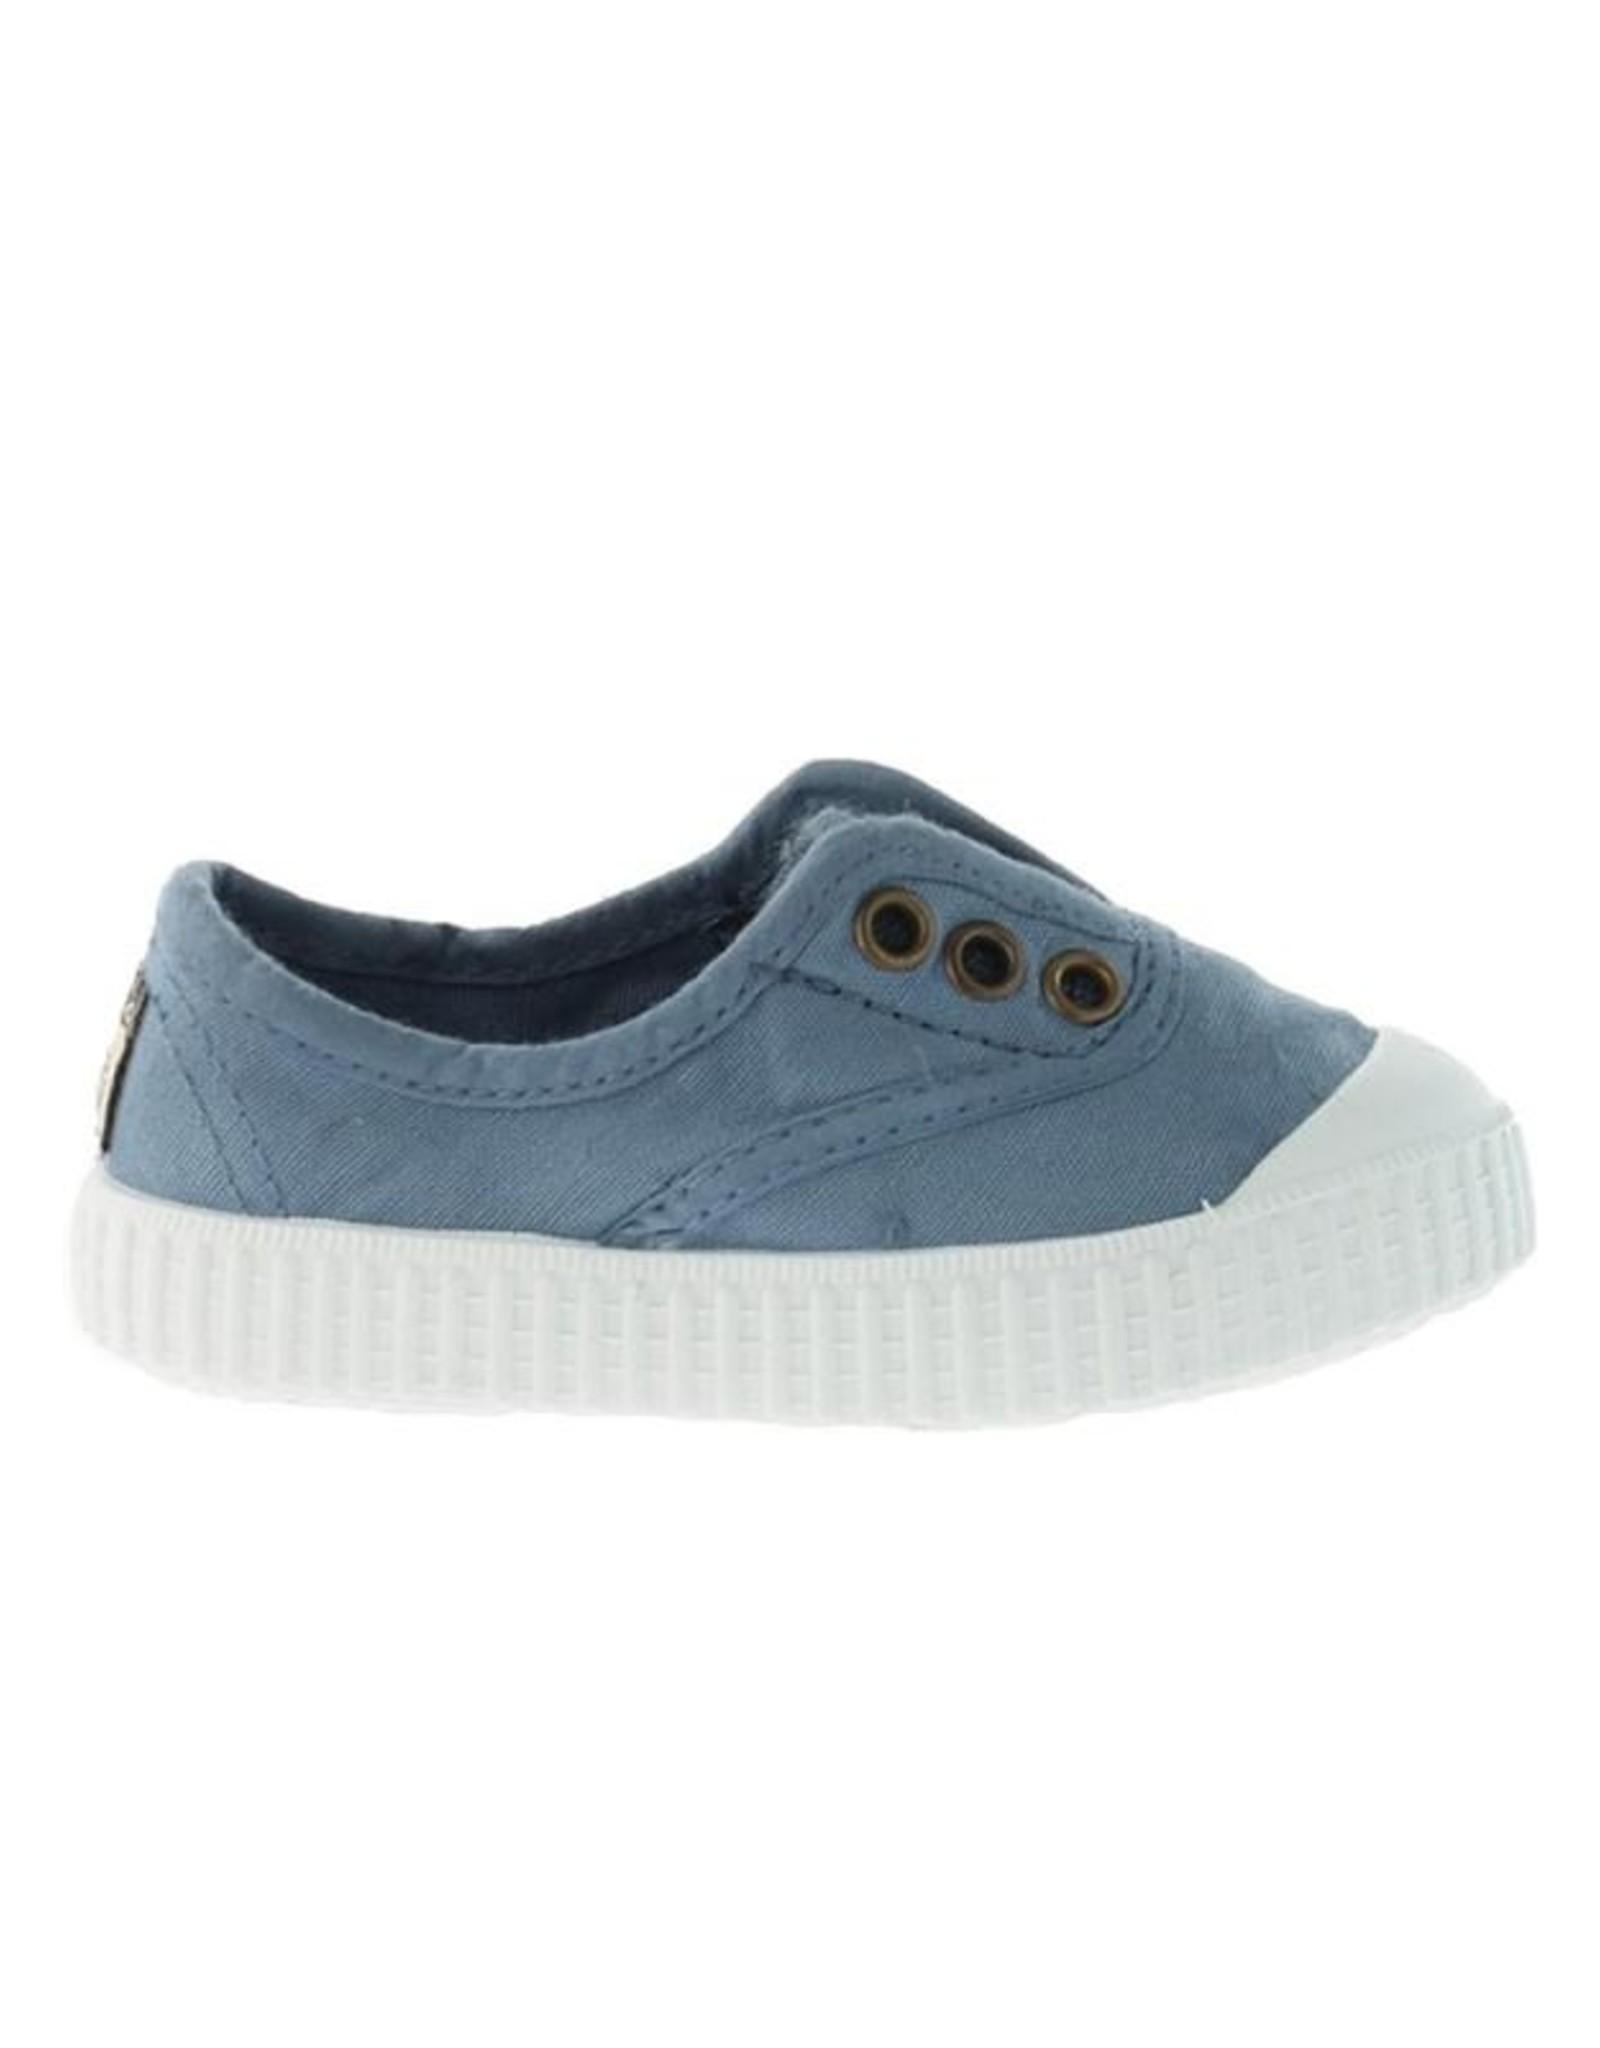 Victoria Blue Shoe Style 106627